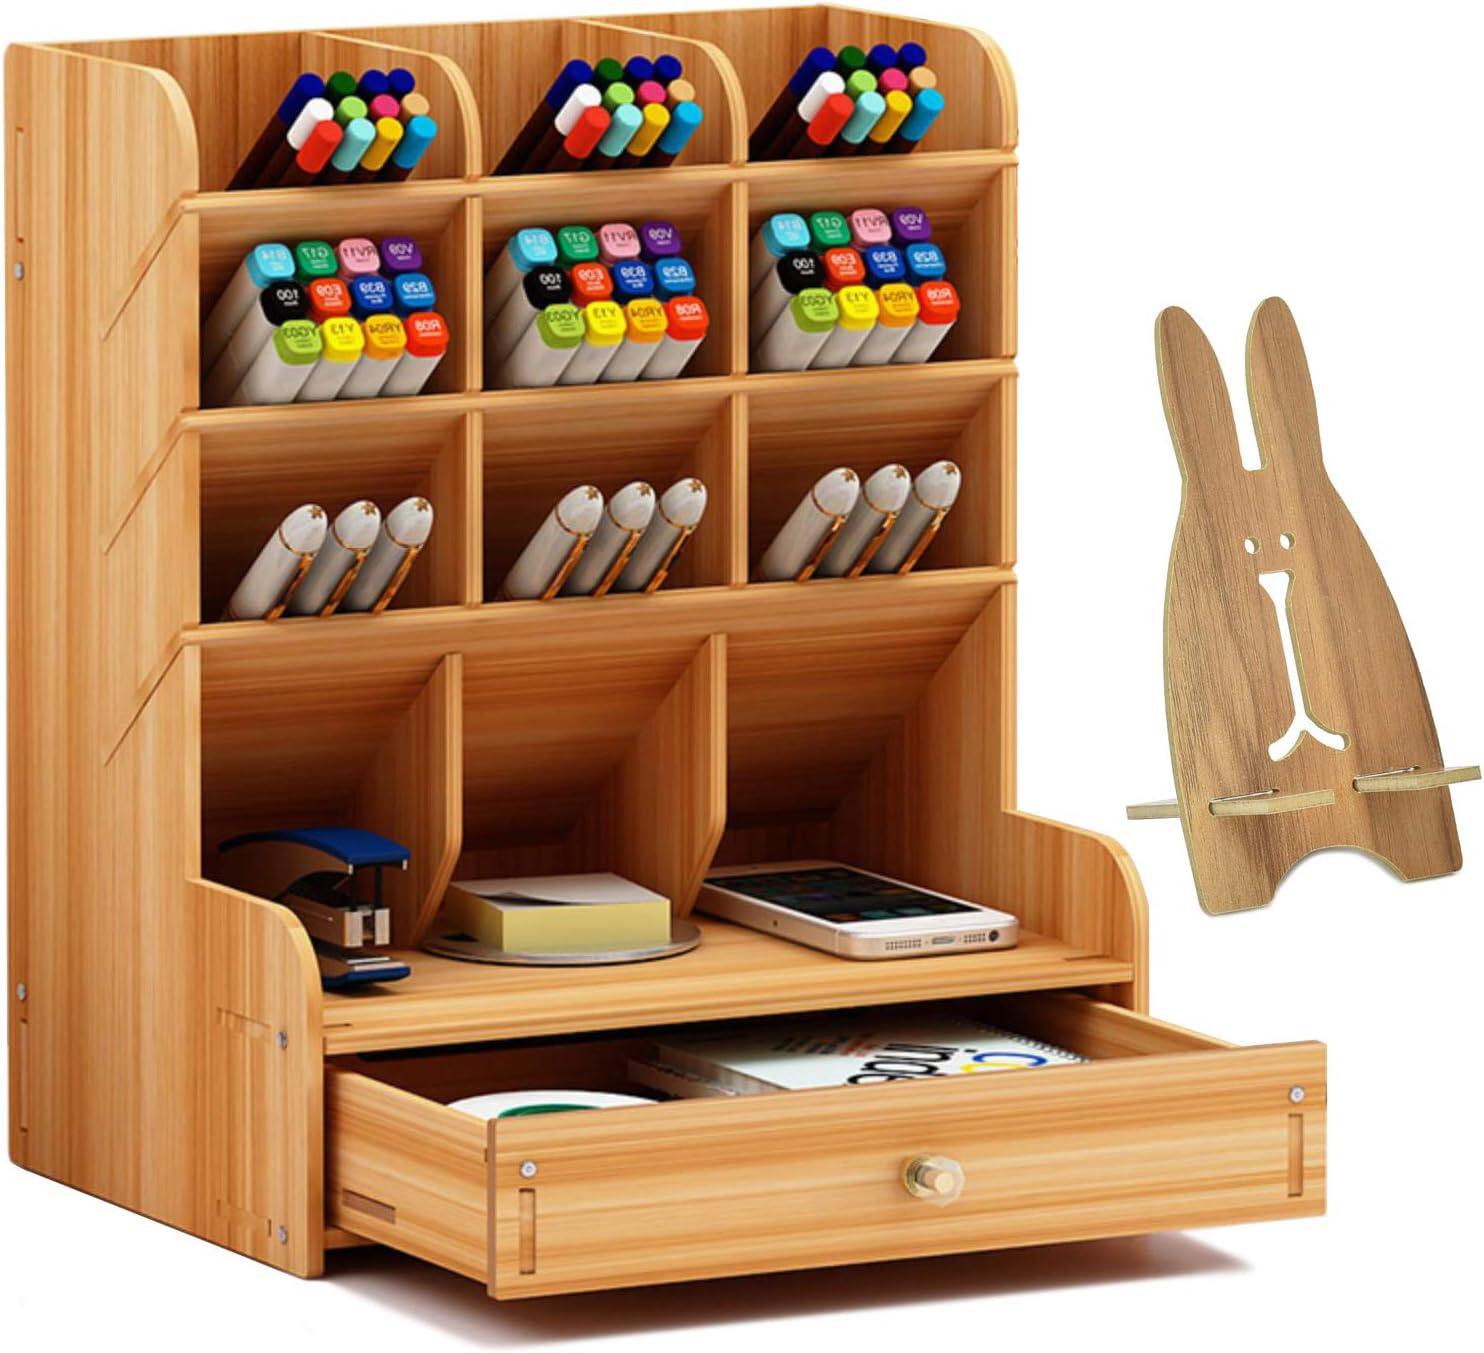 Wood Desk Organizer San Francisco Mall San Diego Mall With Drawer pen Holder Multipurpose Pencil